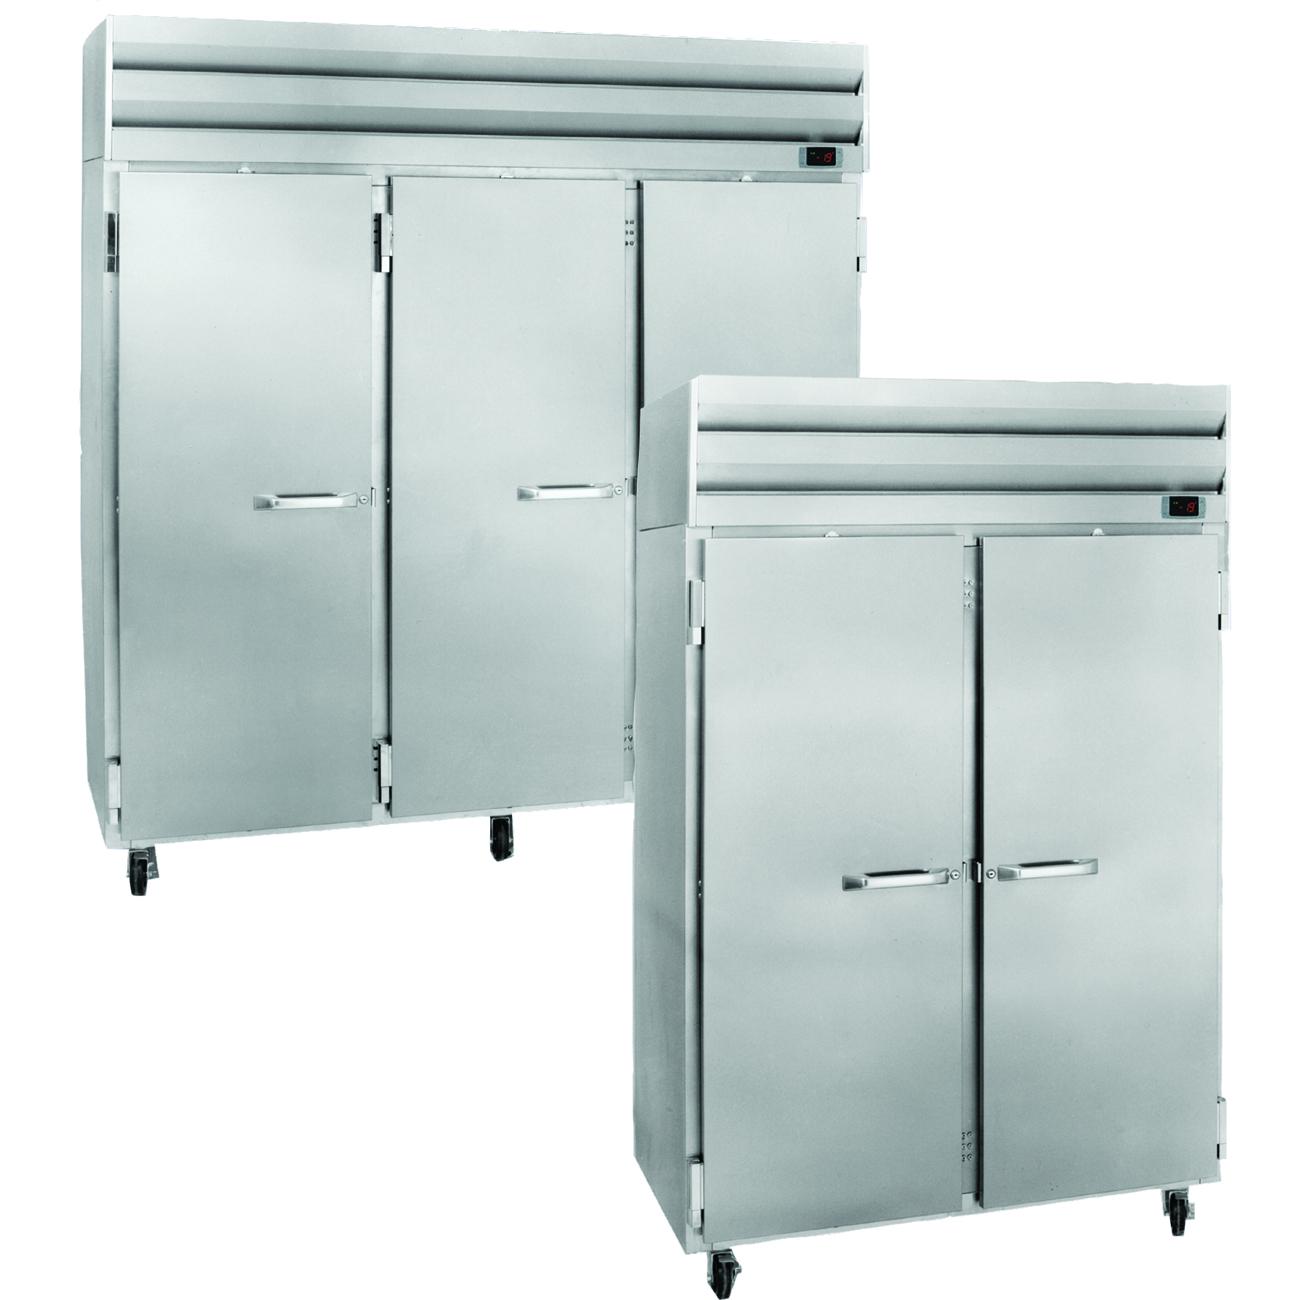 Howard-McCray SR75-S refrigerator, reach-in